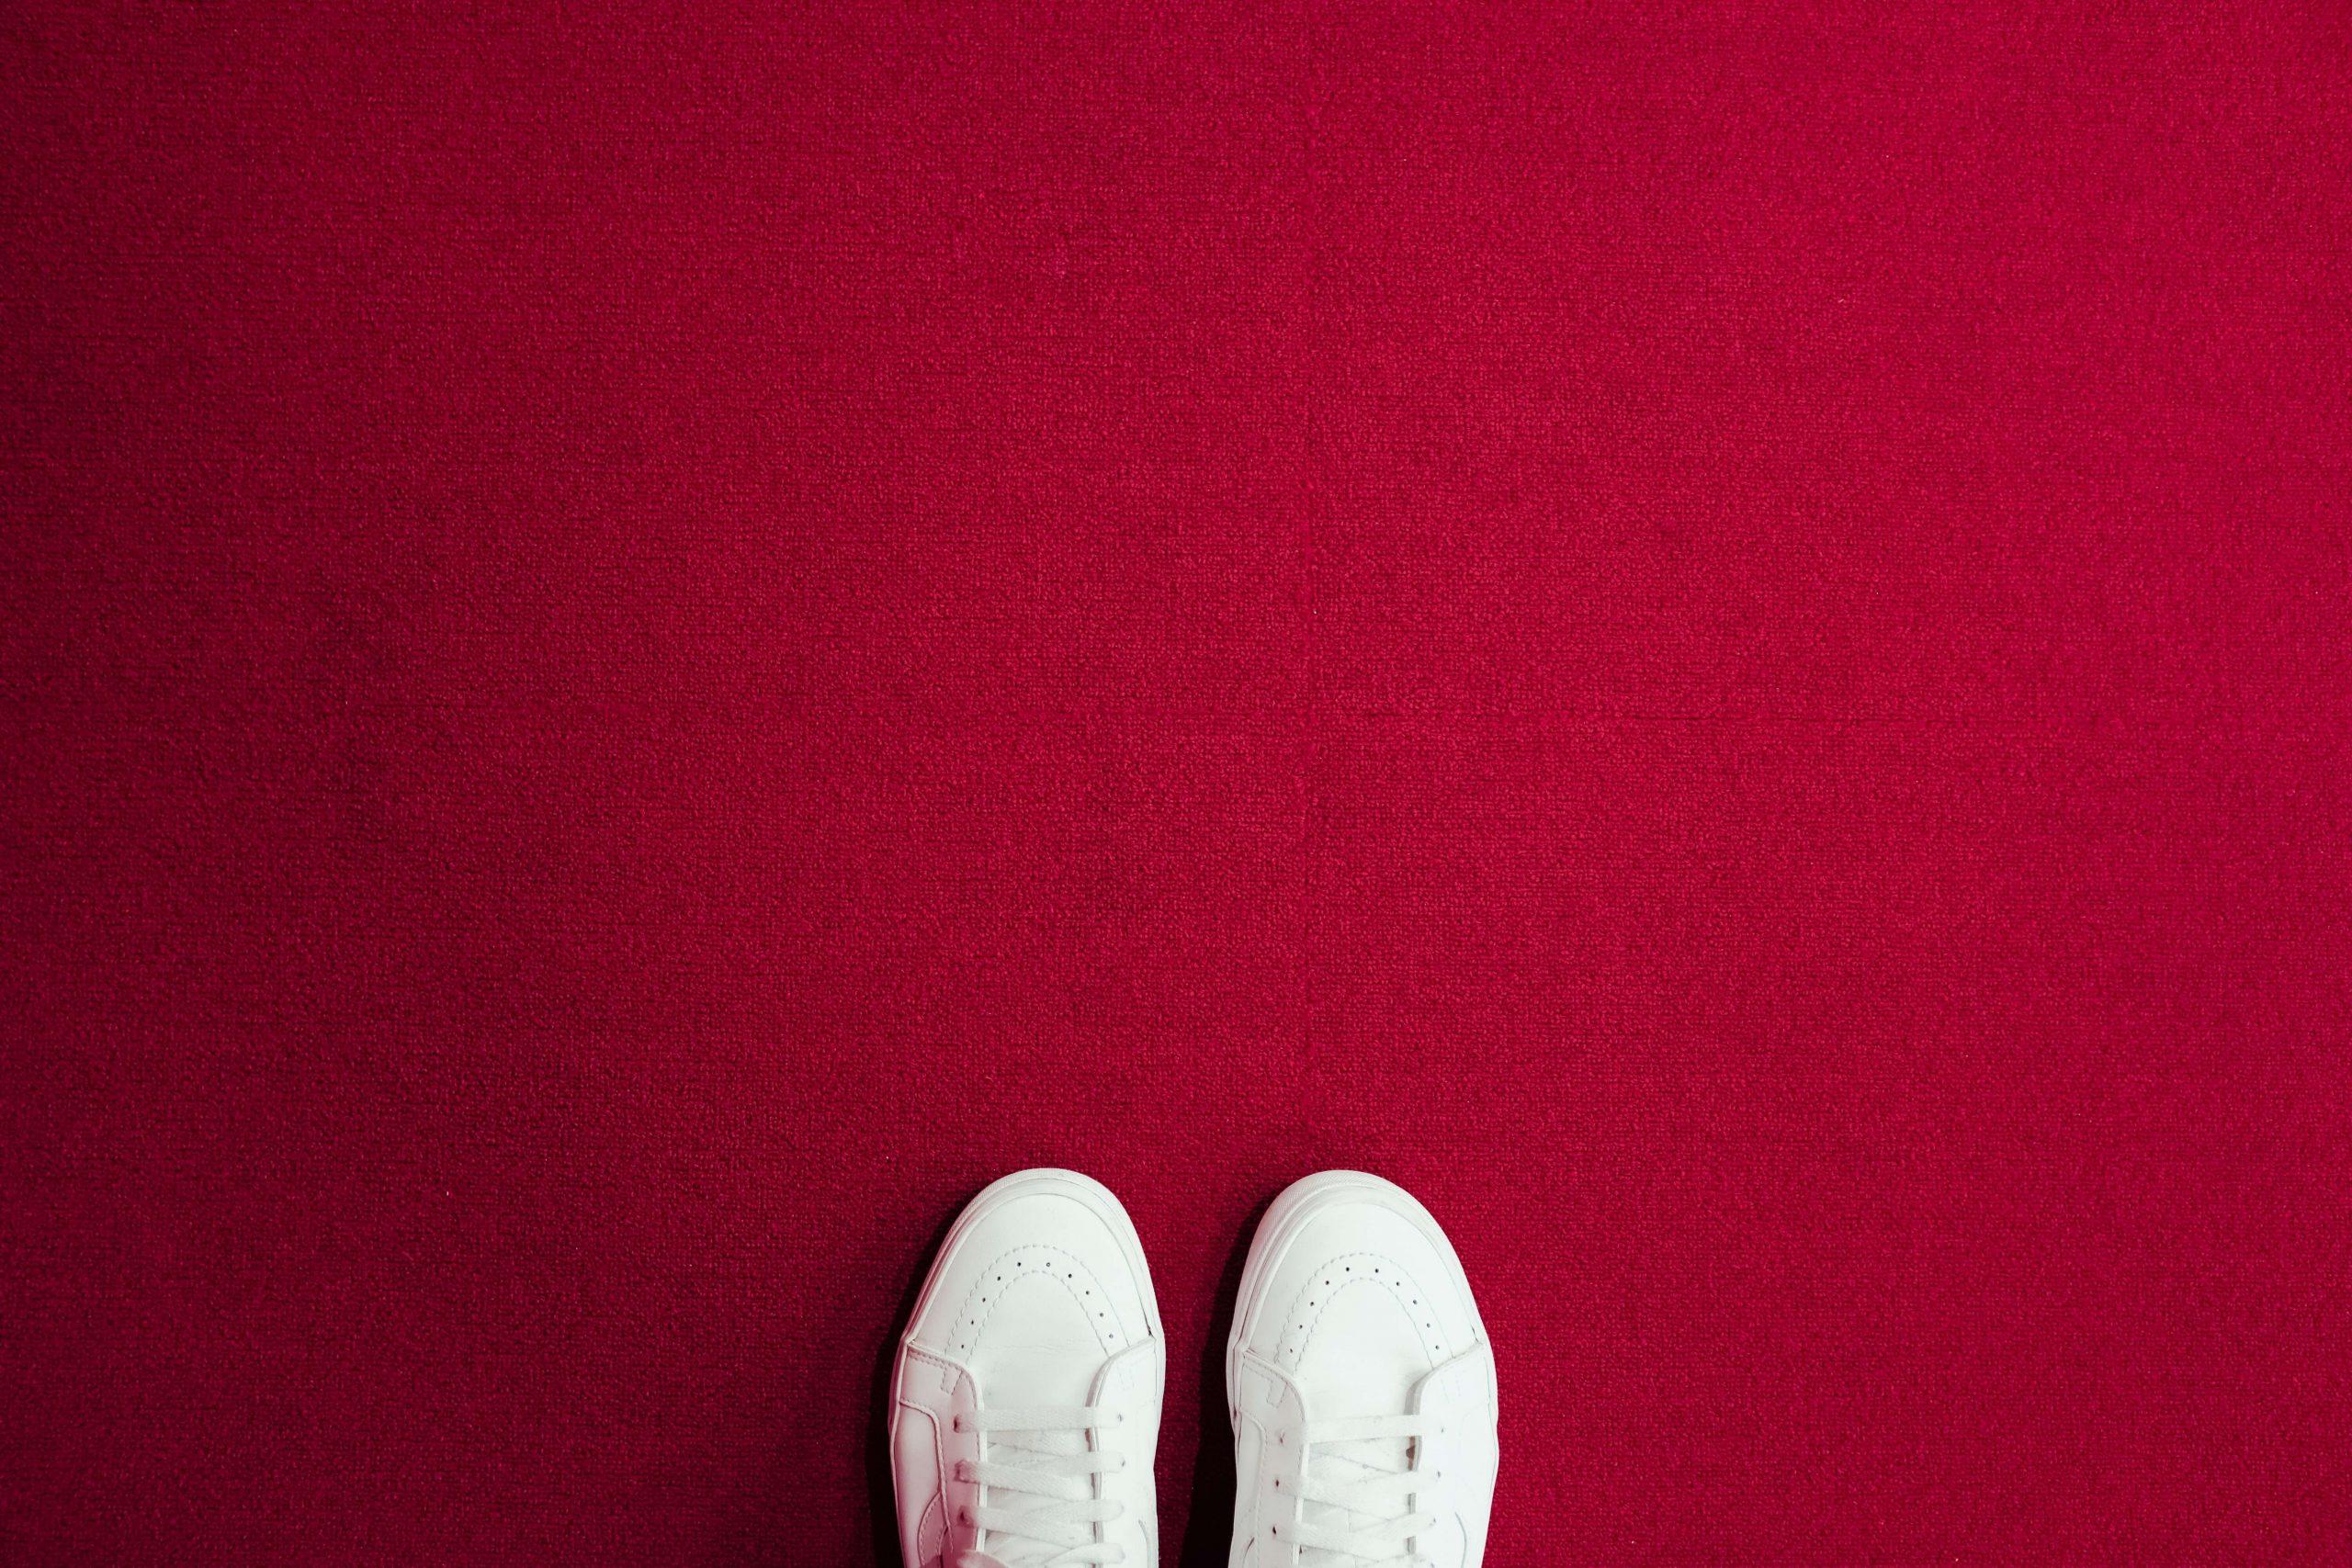 shoes on clean carpet